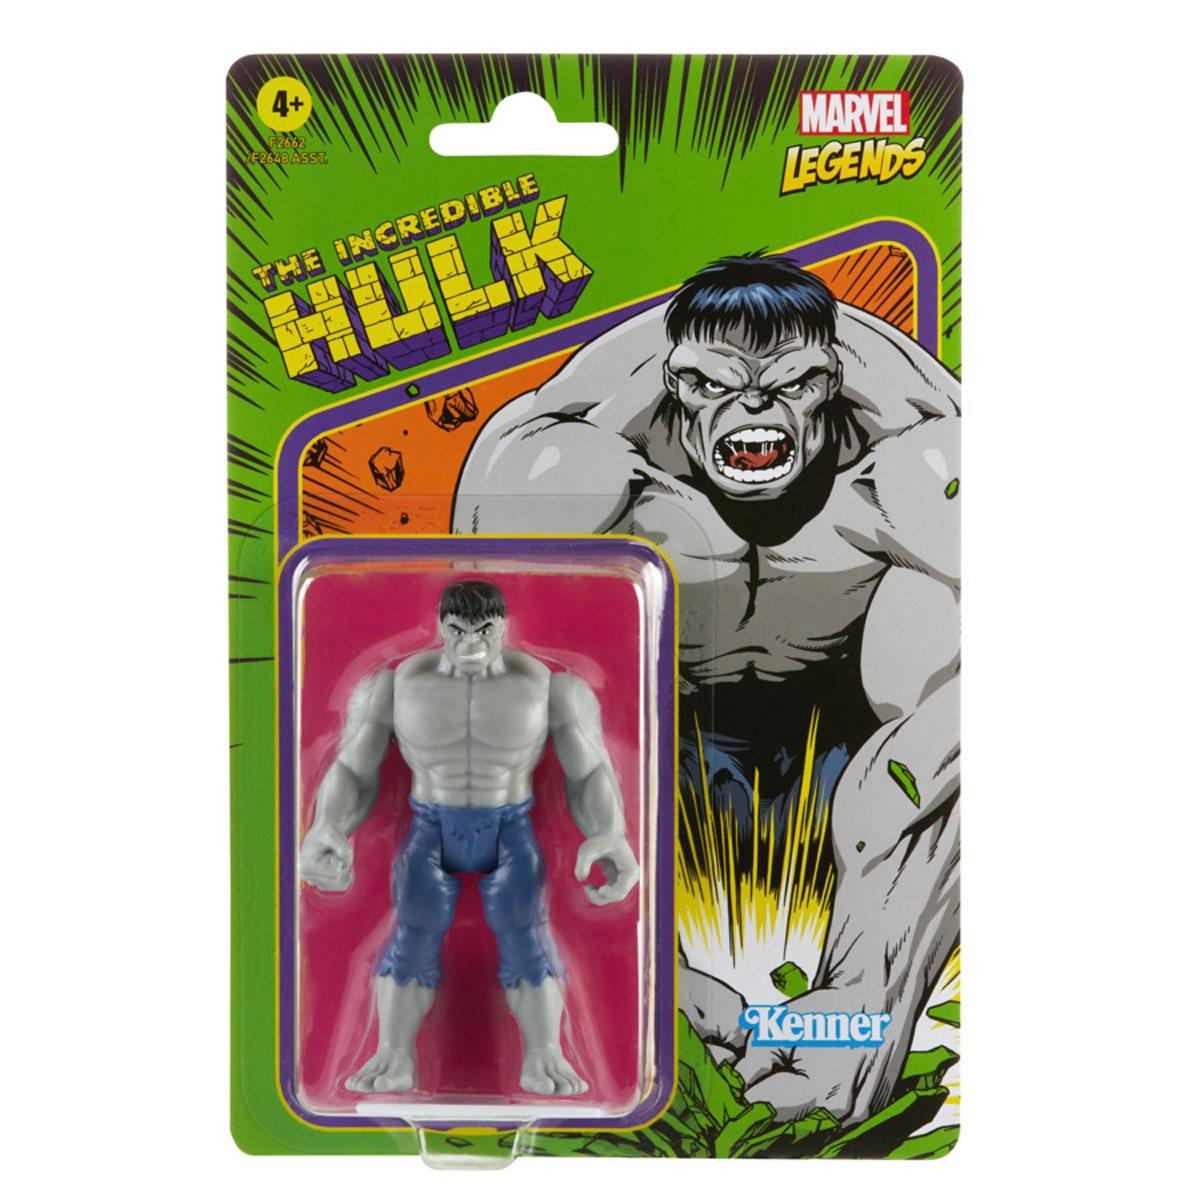 Hasbro-Marvel-Legends-Retro-Gray-Hulk-002